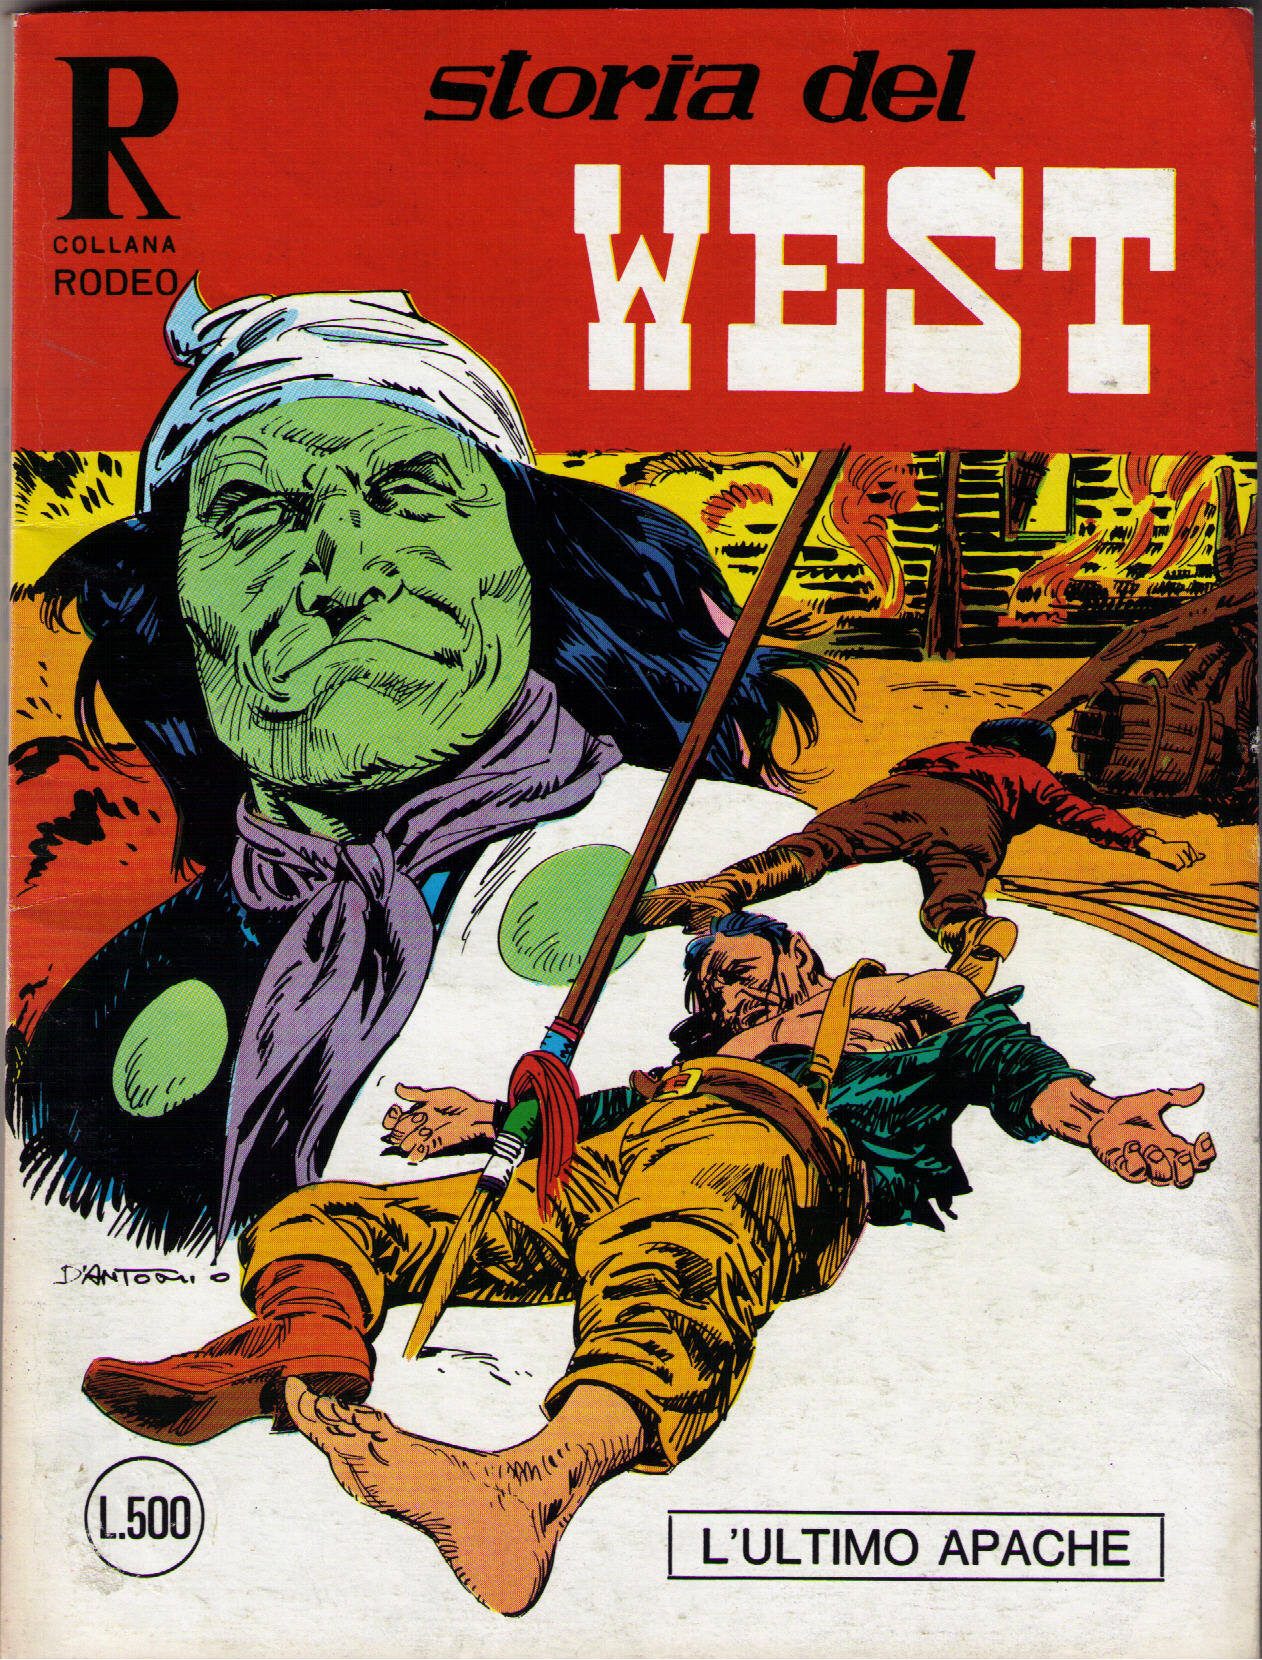 Storia del West n.66 (Collana Rodeo n. 154)